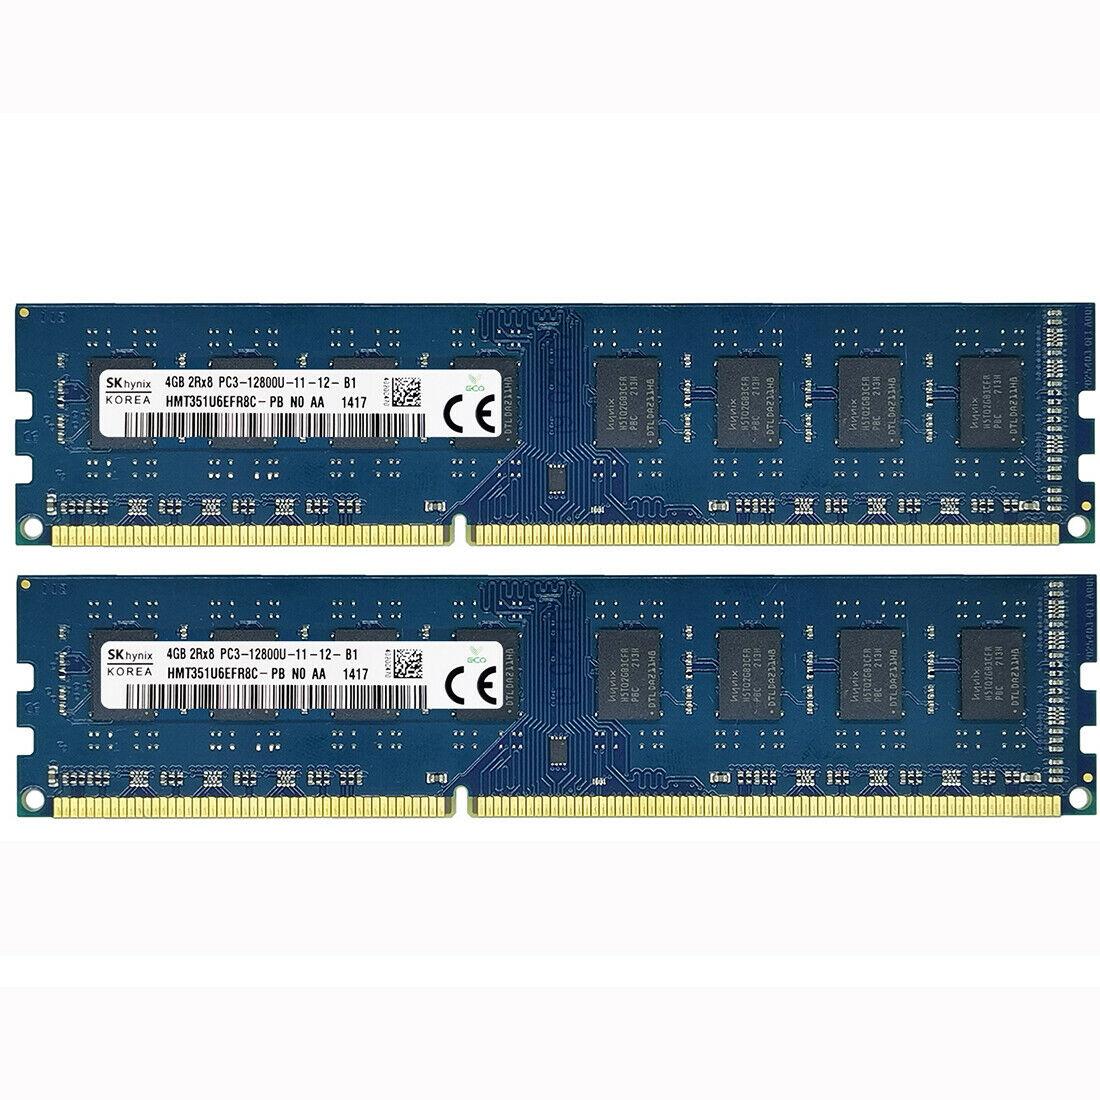 Hynix 8GB kit 2X4GB DDR3-1600MHZ 1333MHZ PC3-12800U PC3-10600U 240PIN memoria de escritorio...